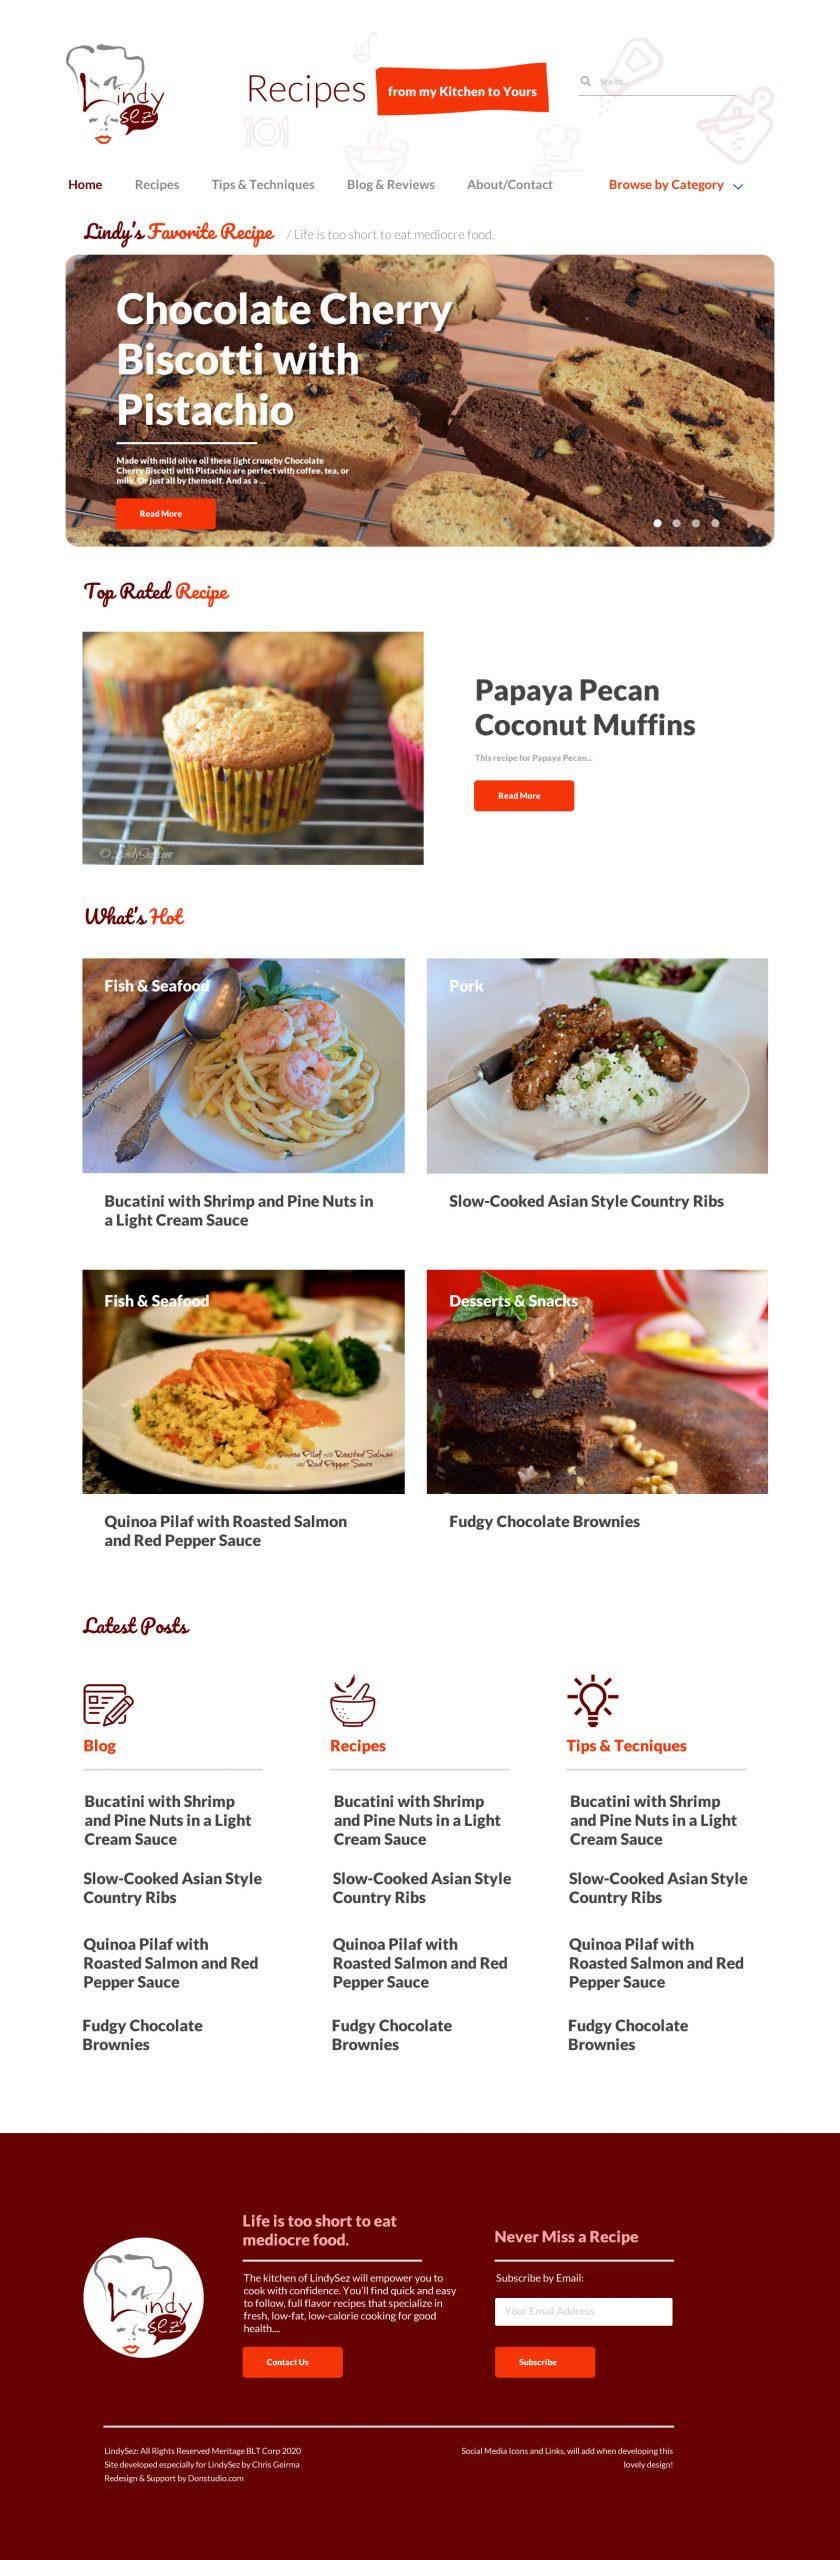 Chef Blog Redesign - Website Rebuild - Lindysez.com